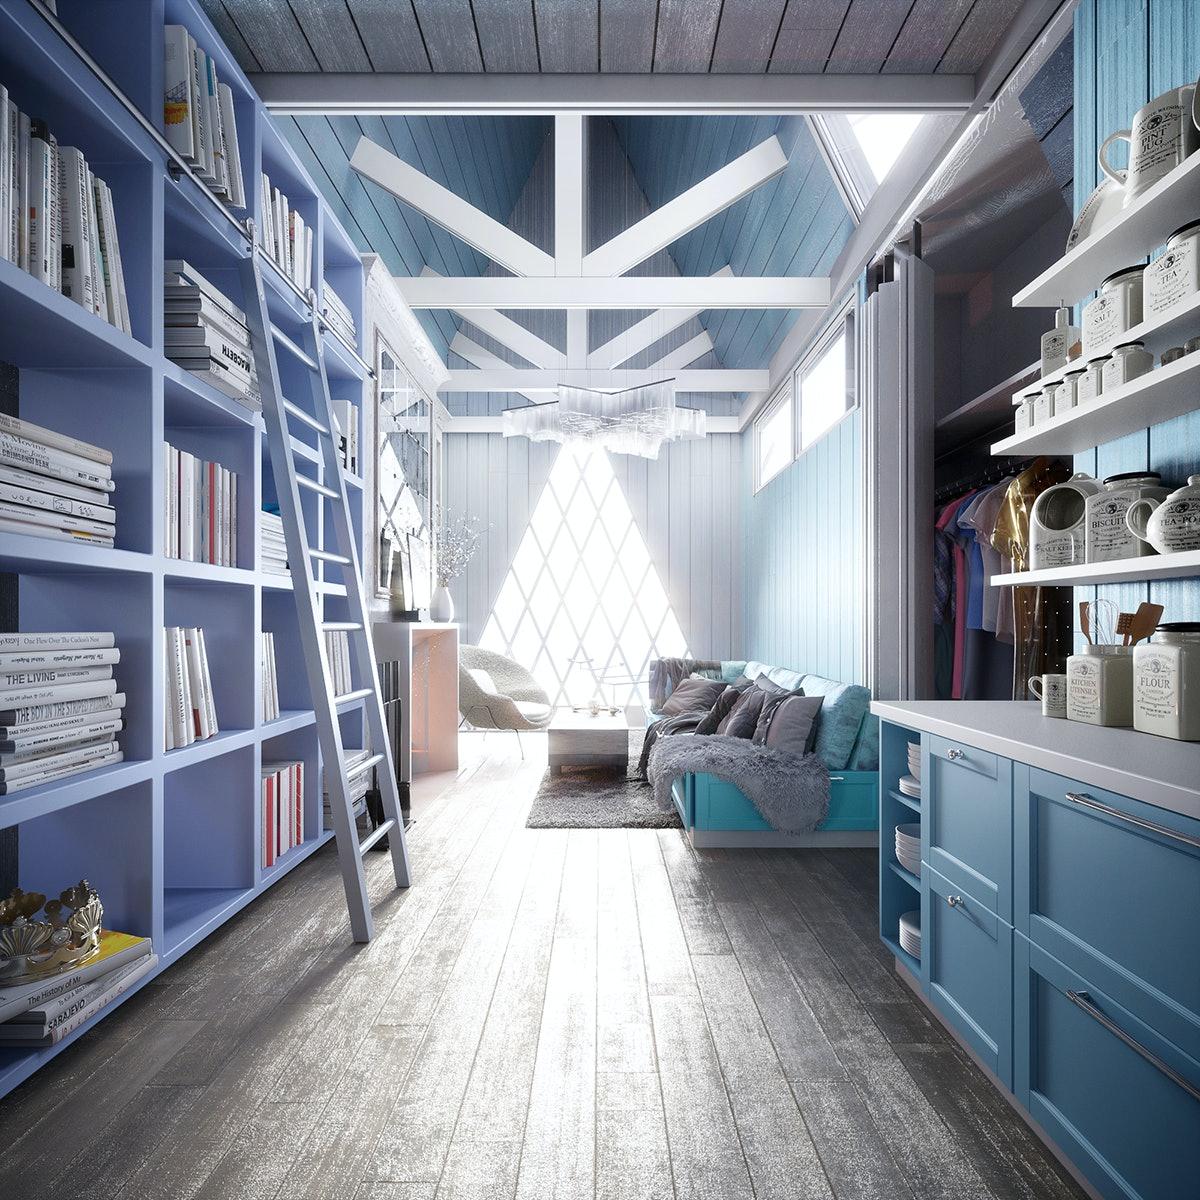 A ladder leans against a blue bookshelf in an Elsa-inspired Disney tiny home.